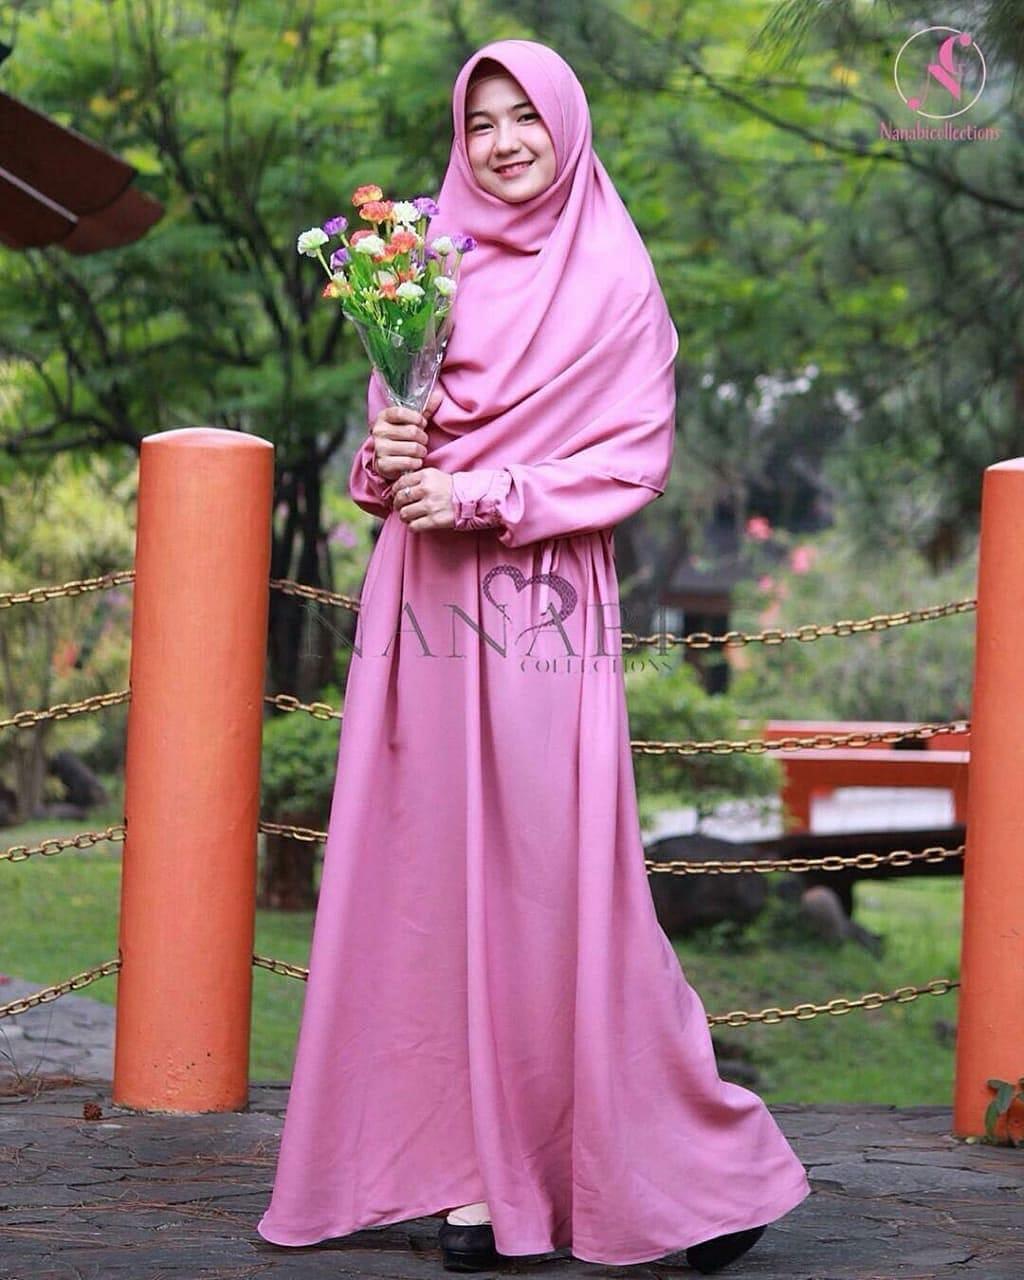 Baju Murah Terbaru Gamis Windi Syar'i Dress Baju Max Mara Baju Terusan Wanita Gamis Casual Baju Panjang Baju Wanita Gamis Syari Baju Muslim Terbaru 2018